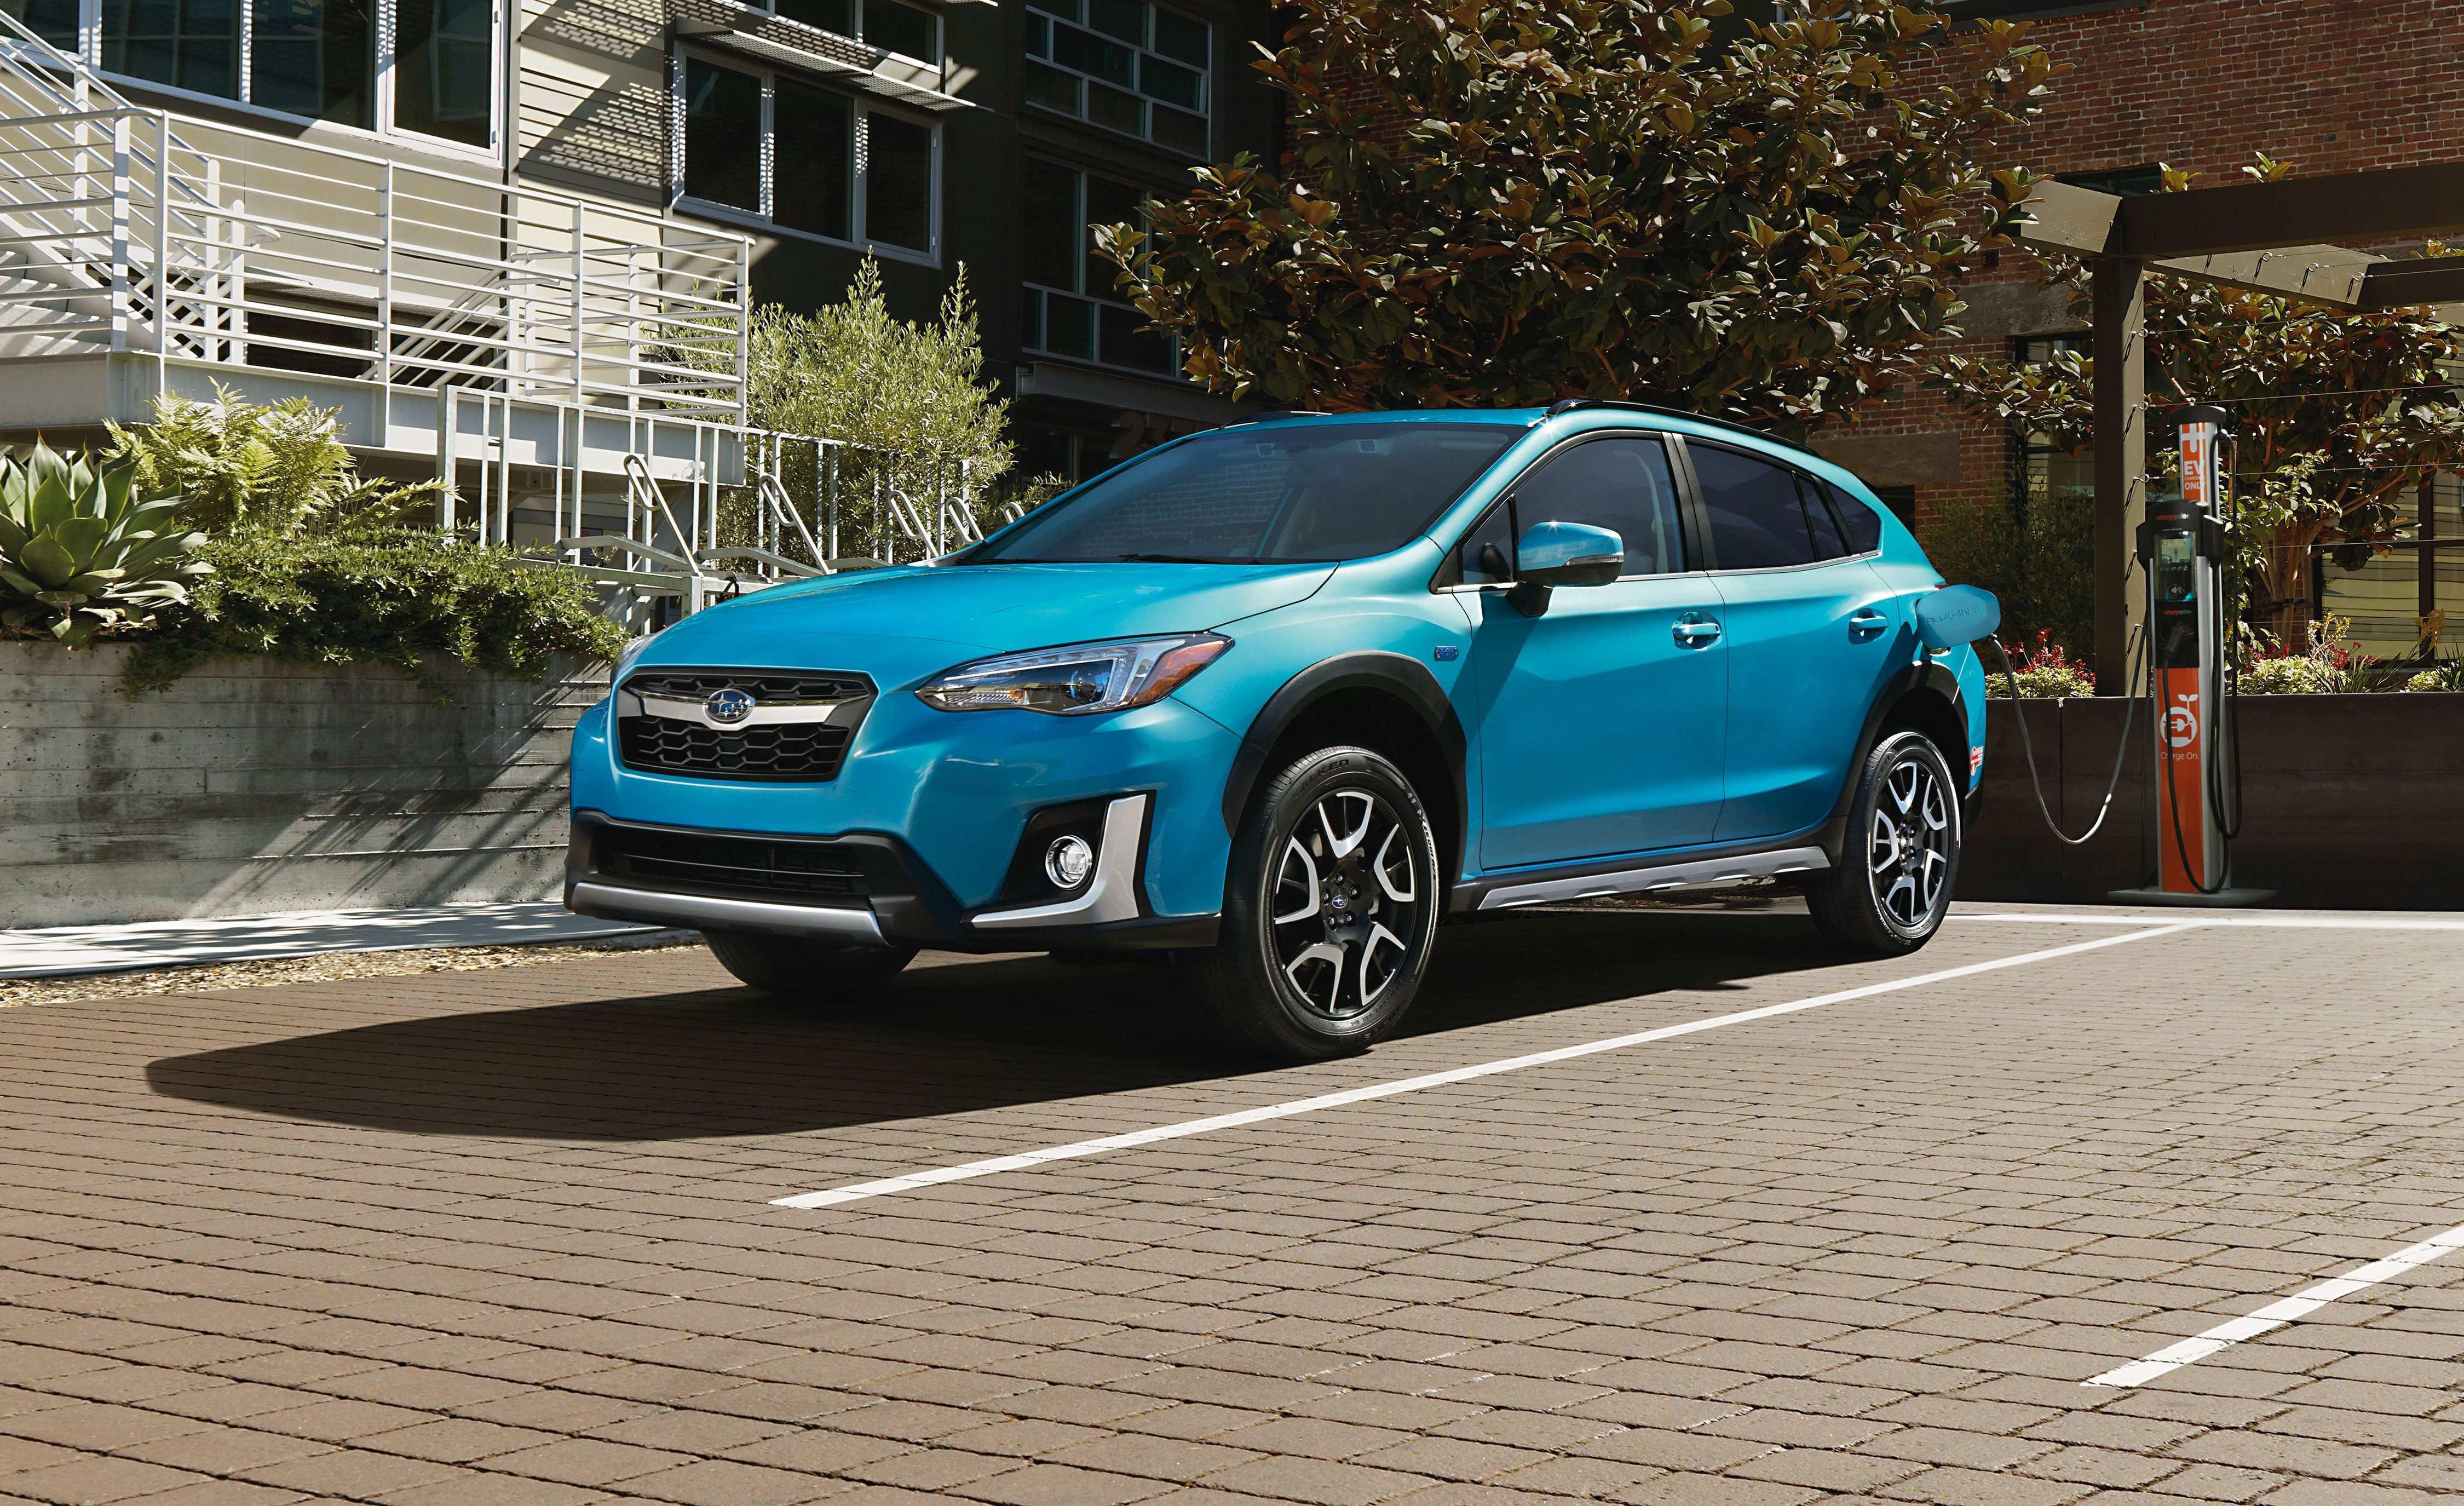 98 Concept of Subaru Plug In Hybrid 2020 Engine for Subaru Plug In Hybrid 2020